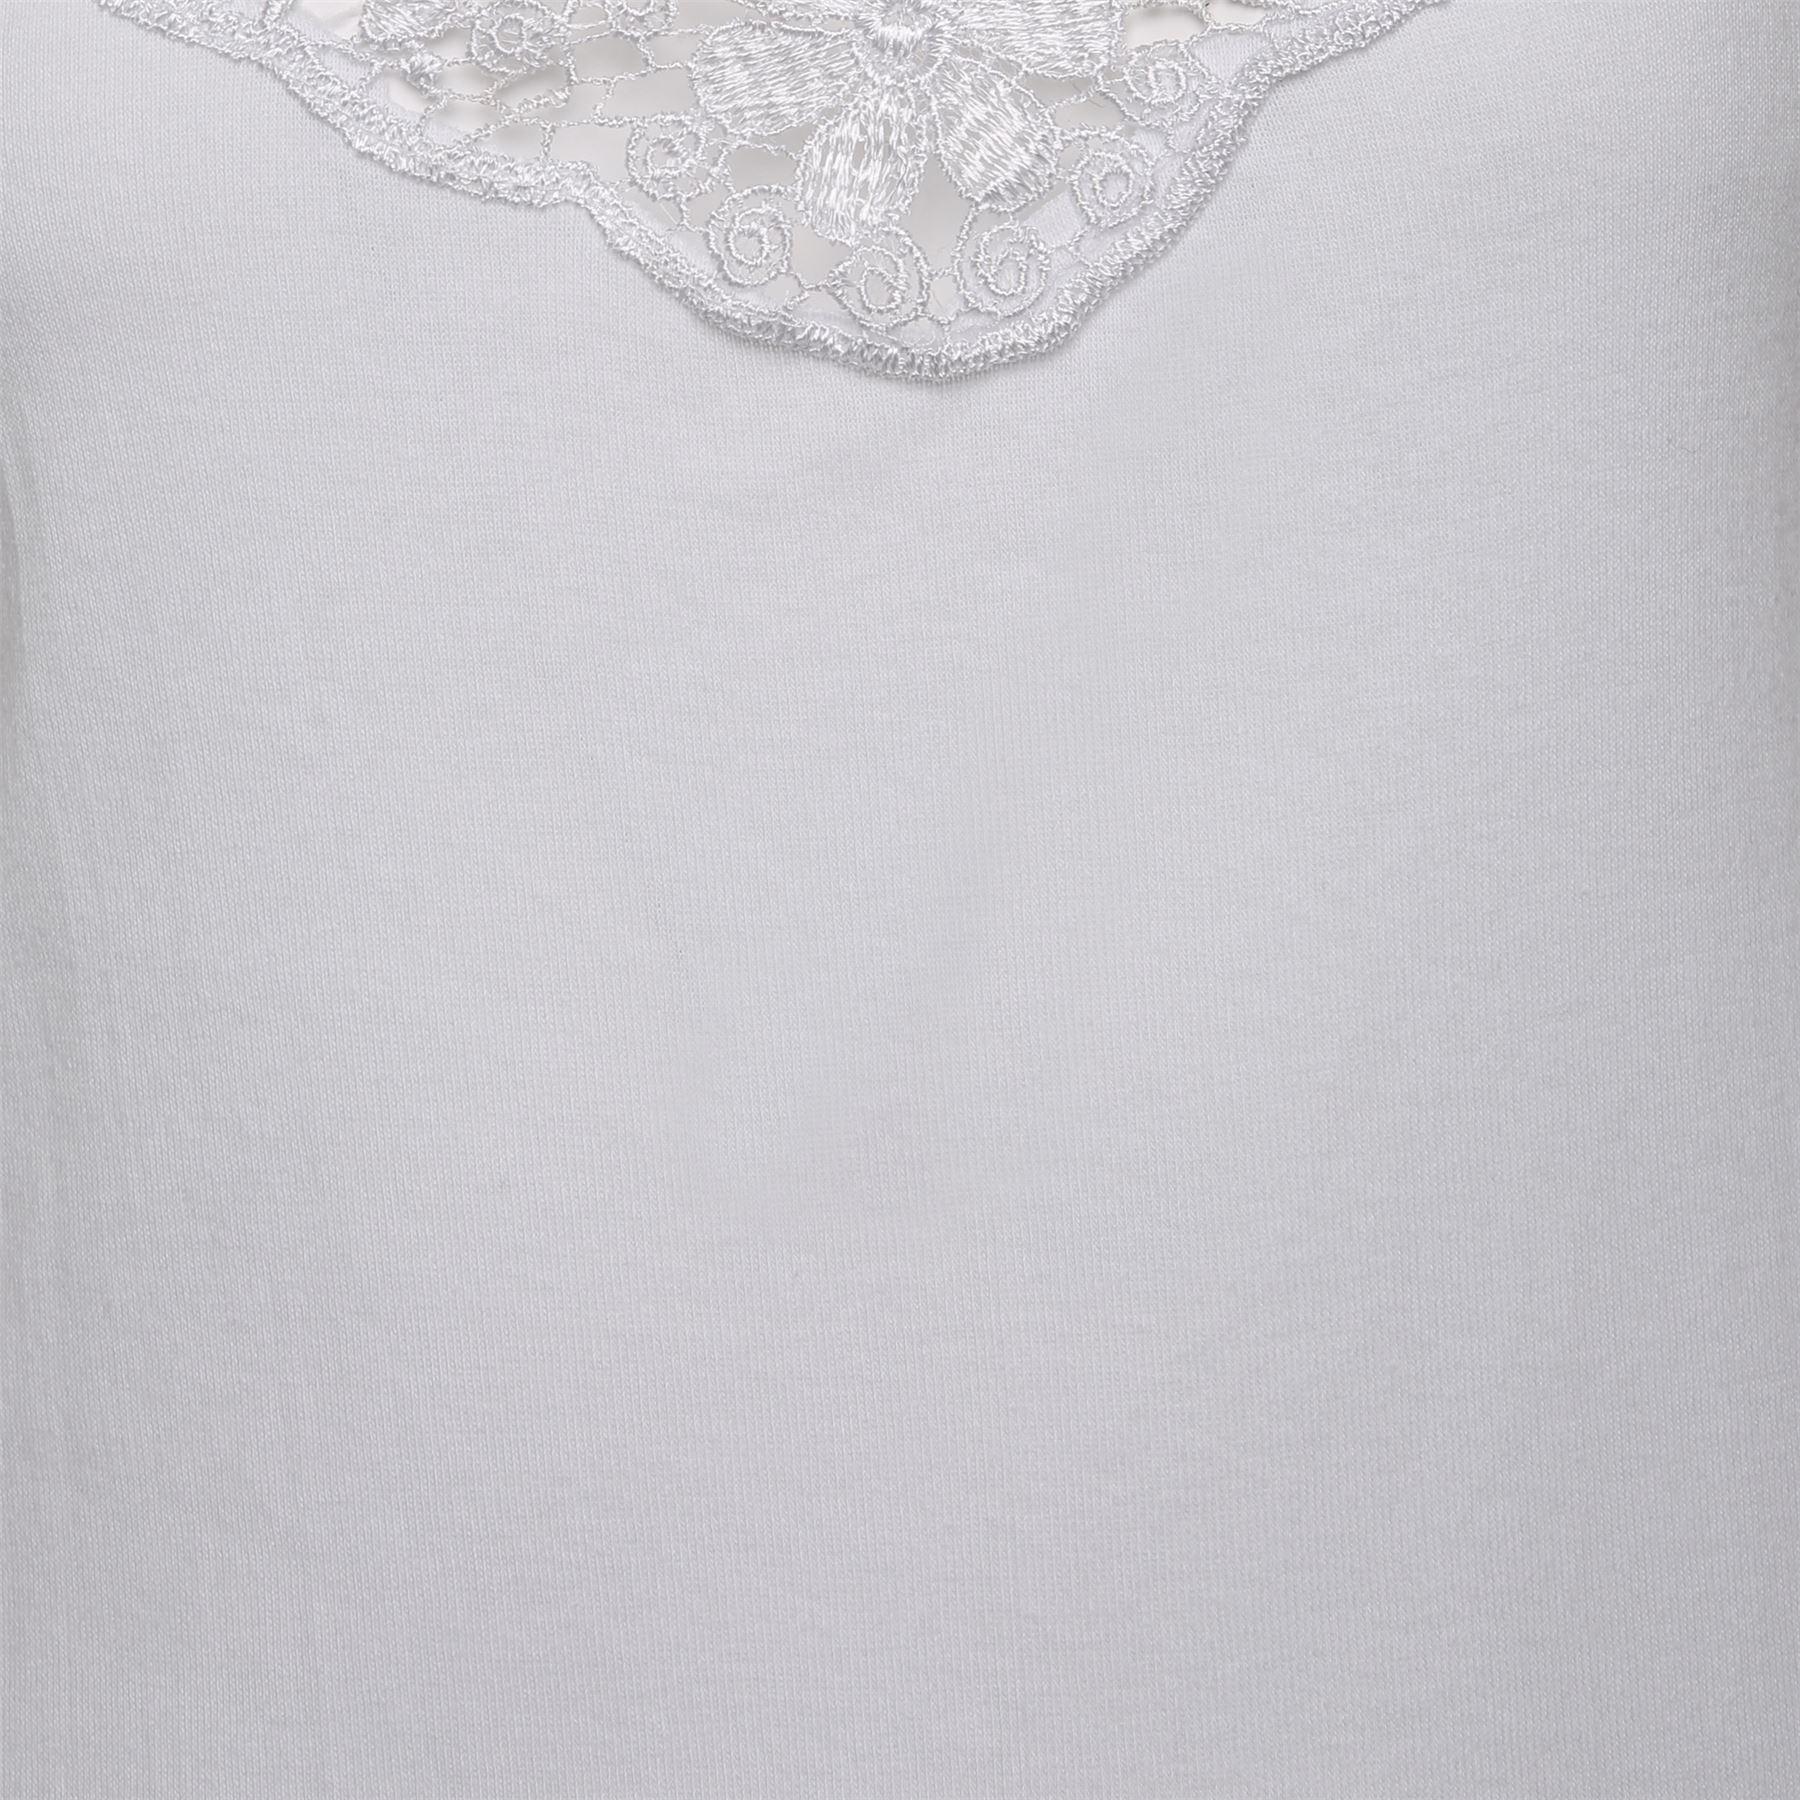 Ladies Cotton Camisole Vest Tops Neck Design Lace Trim Cami Strappy Black White